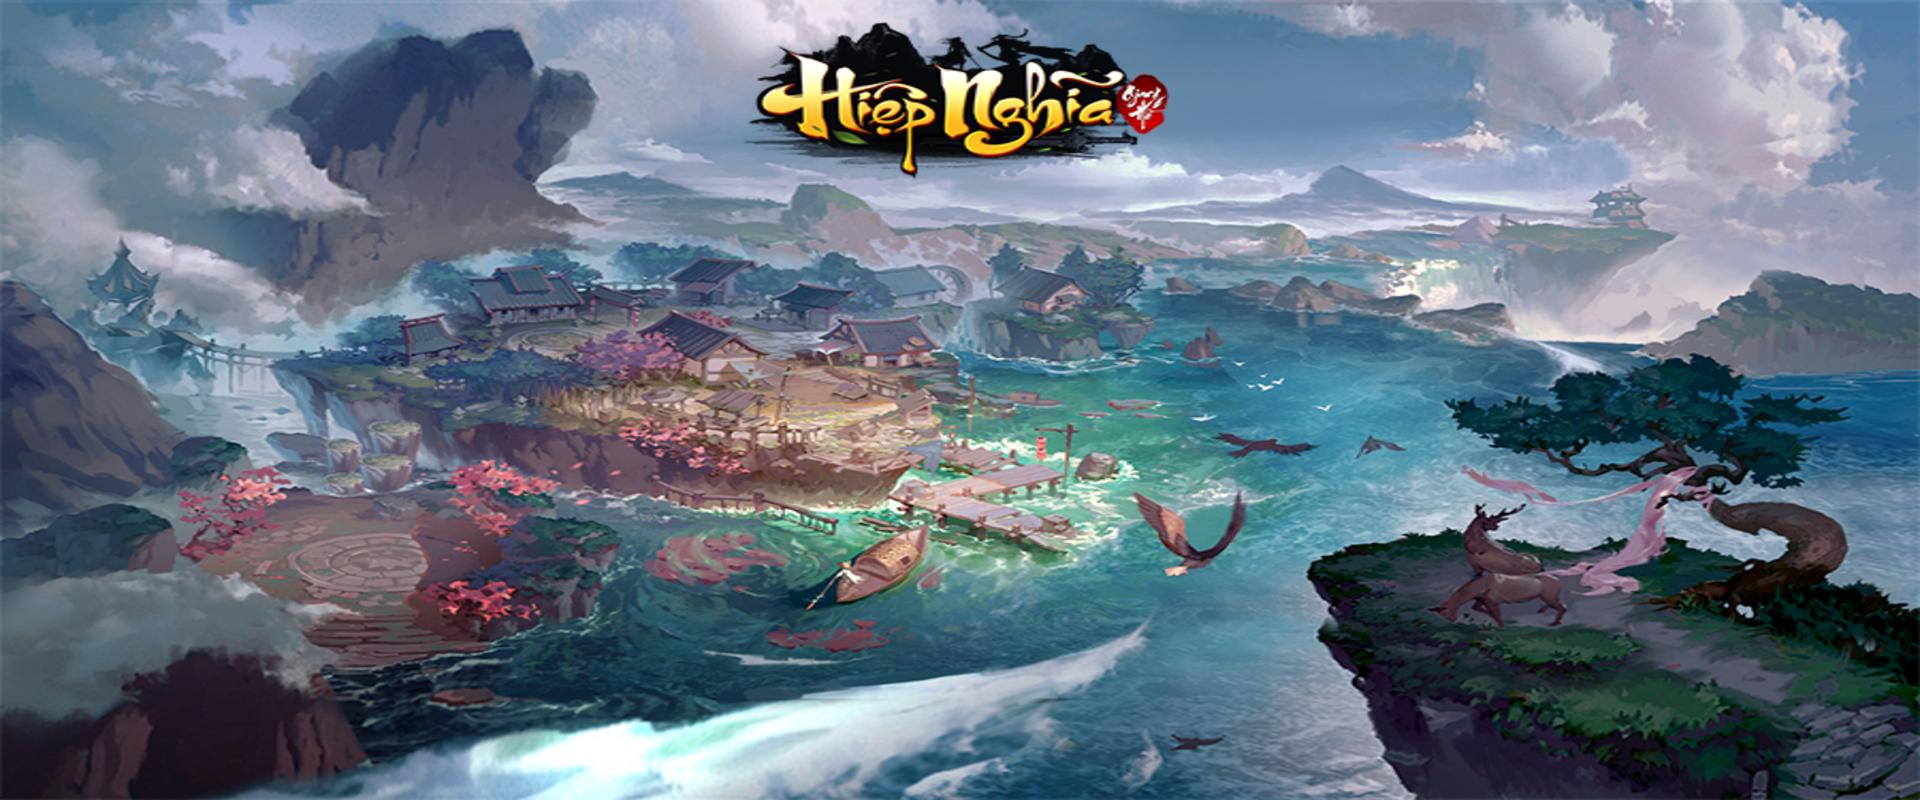 Hiệp Nghĩa Giang Hồ